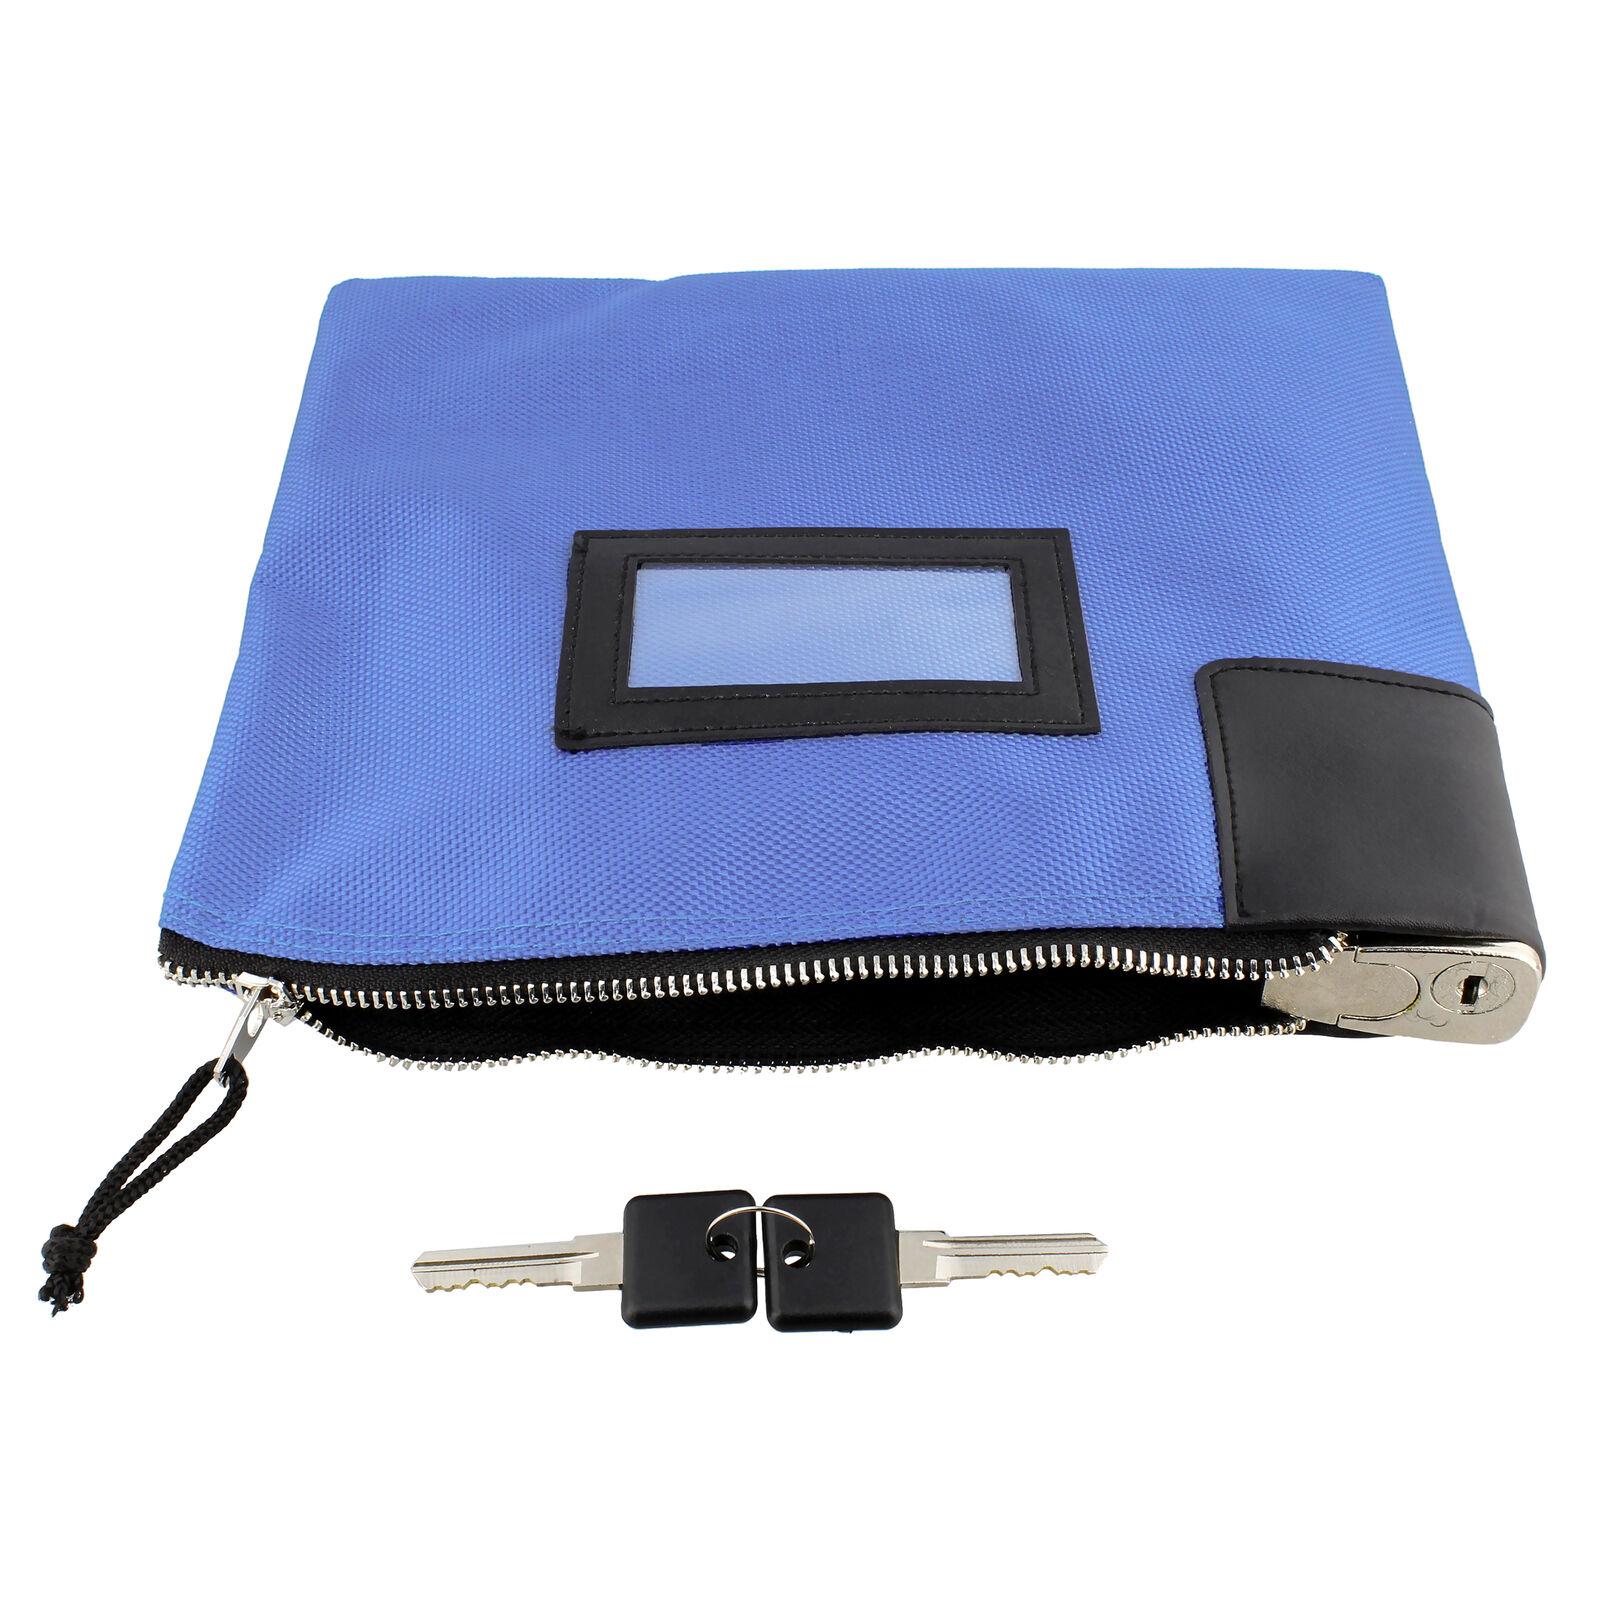 BISupply  Locking Money Bag Lock Bag Bank Bag with Lock Cash Bag in Bright Blue